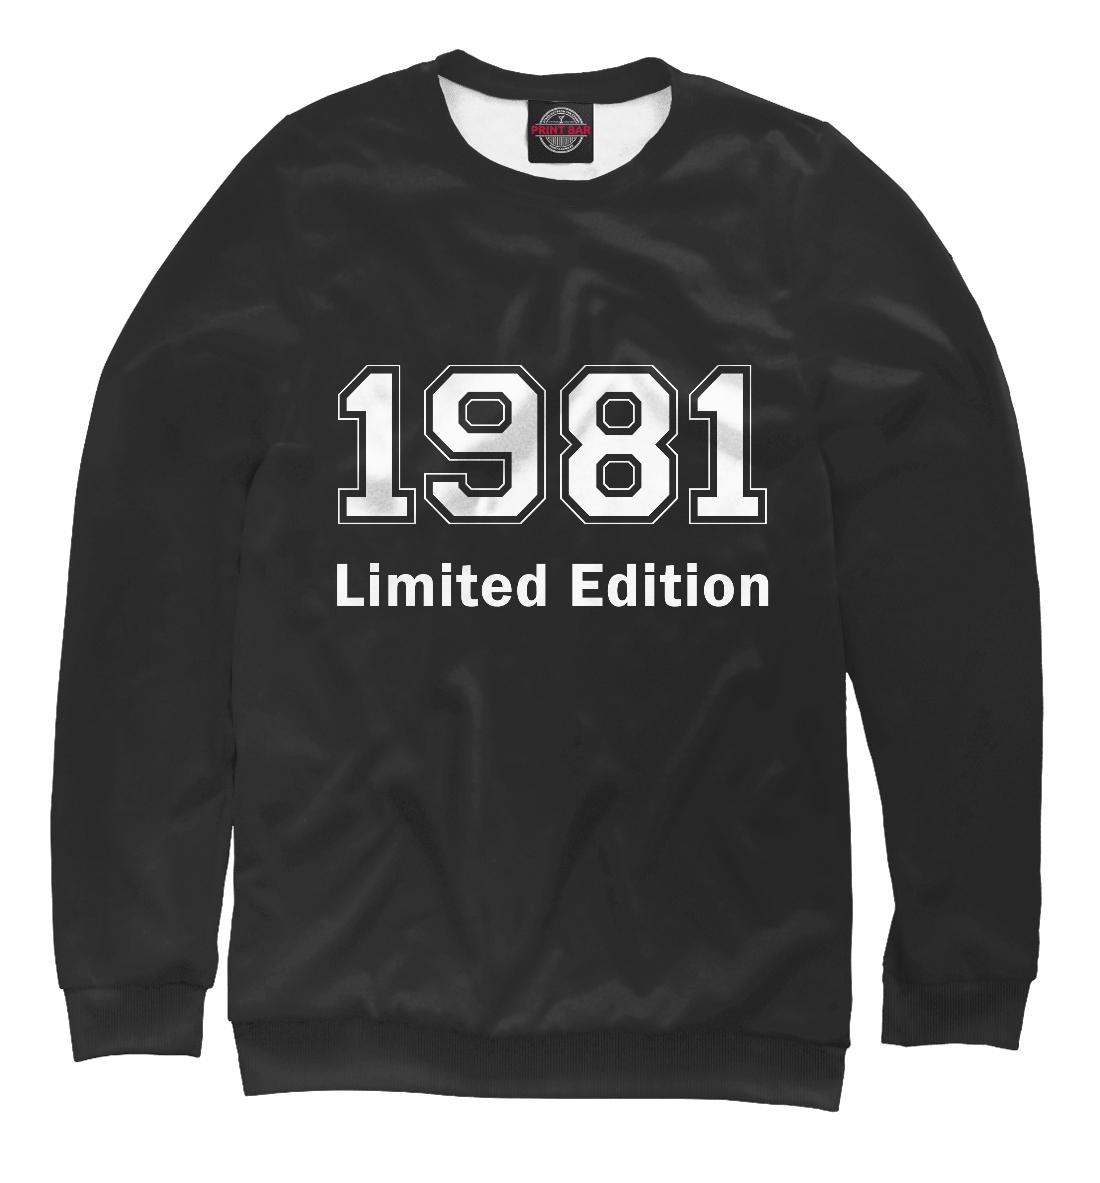 Купить 1981 Limited Edition, Printbar, Свитшоты, DVO-290625-swi-1